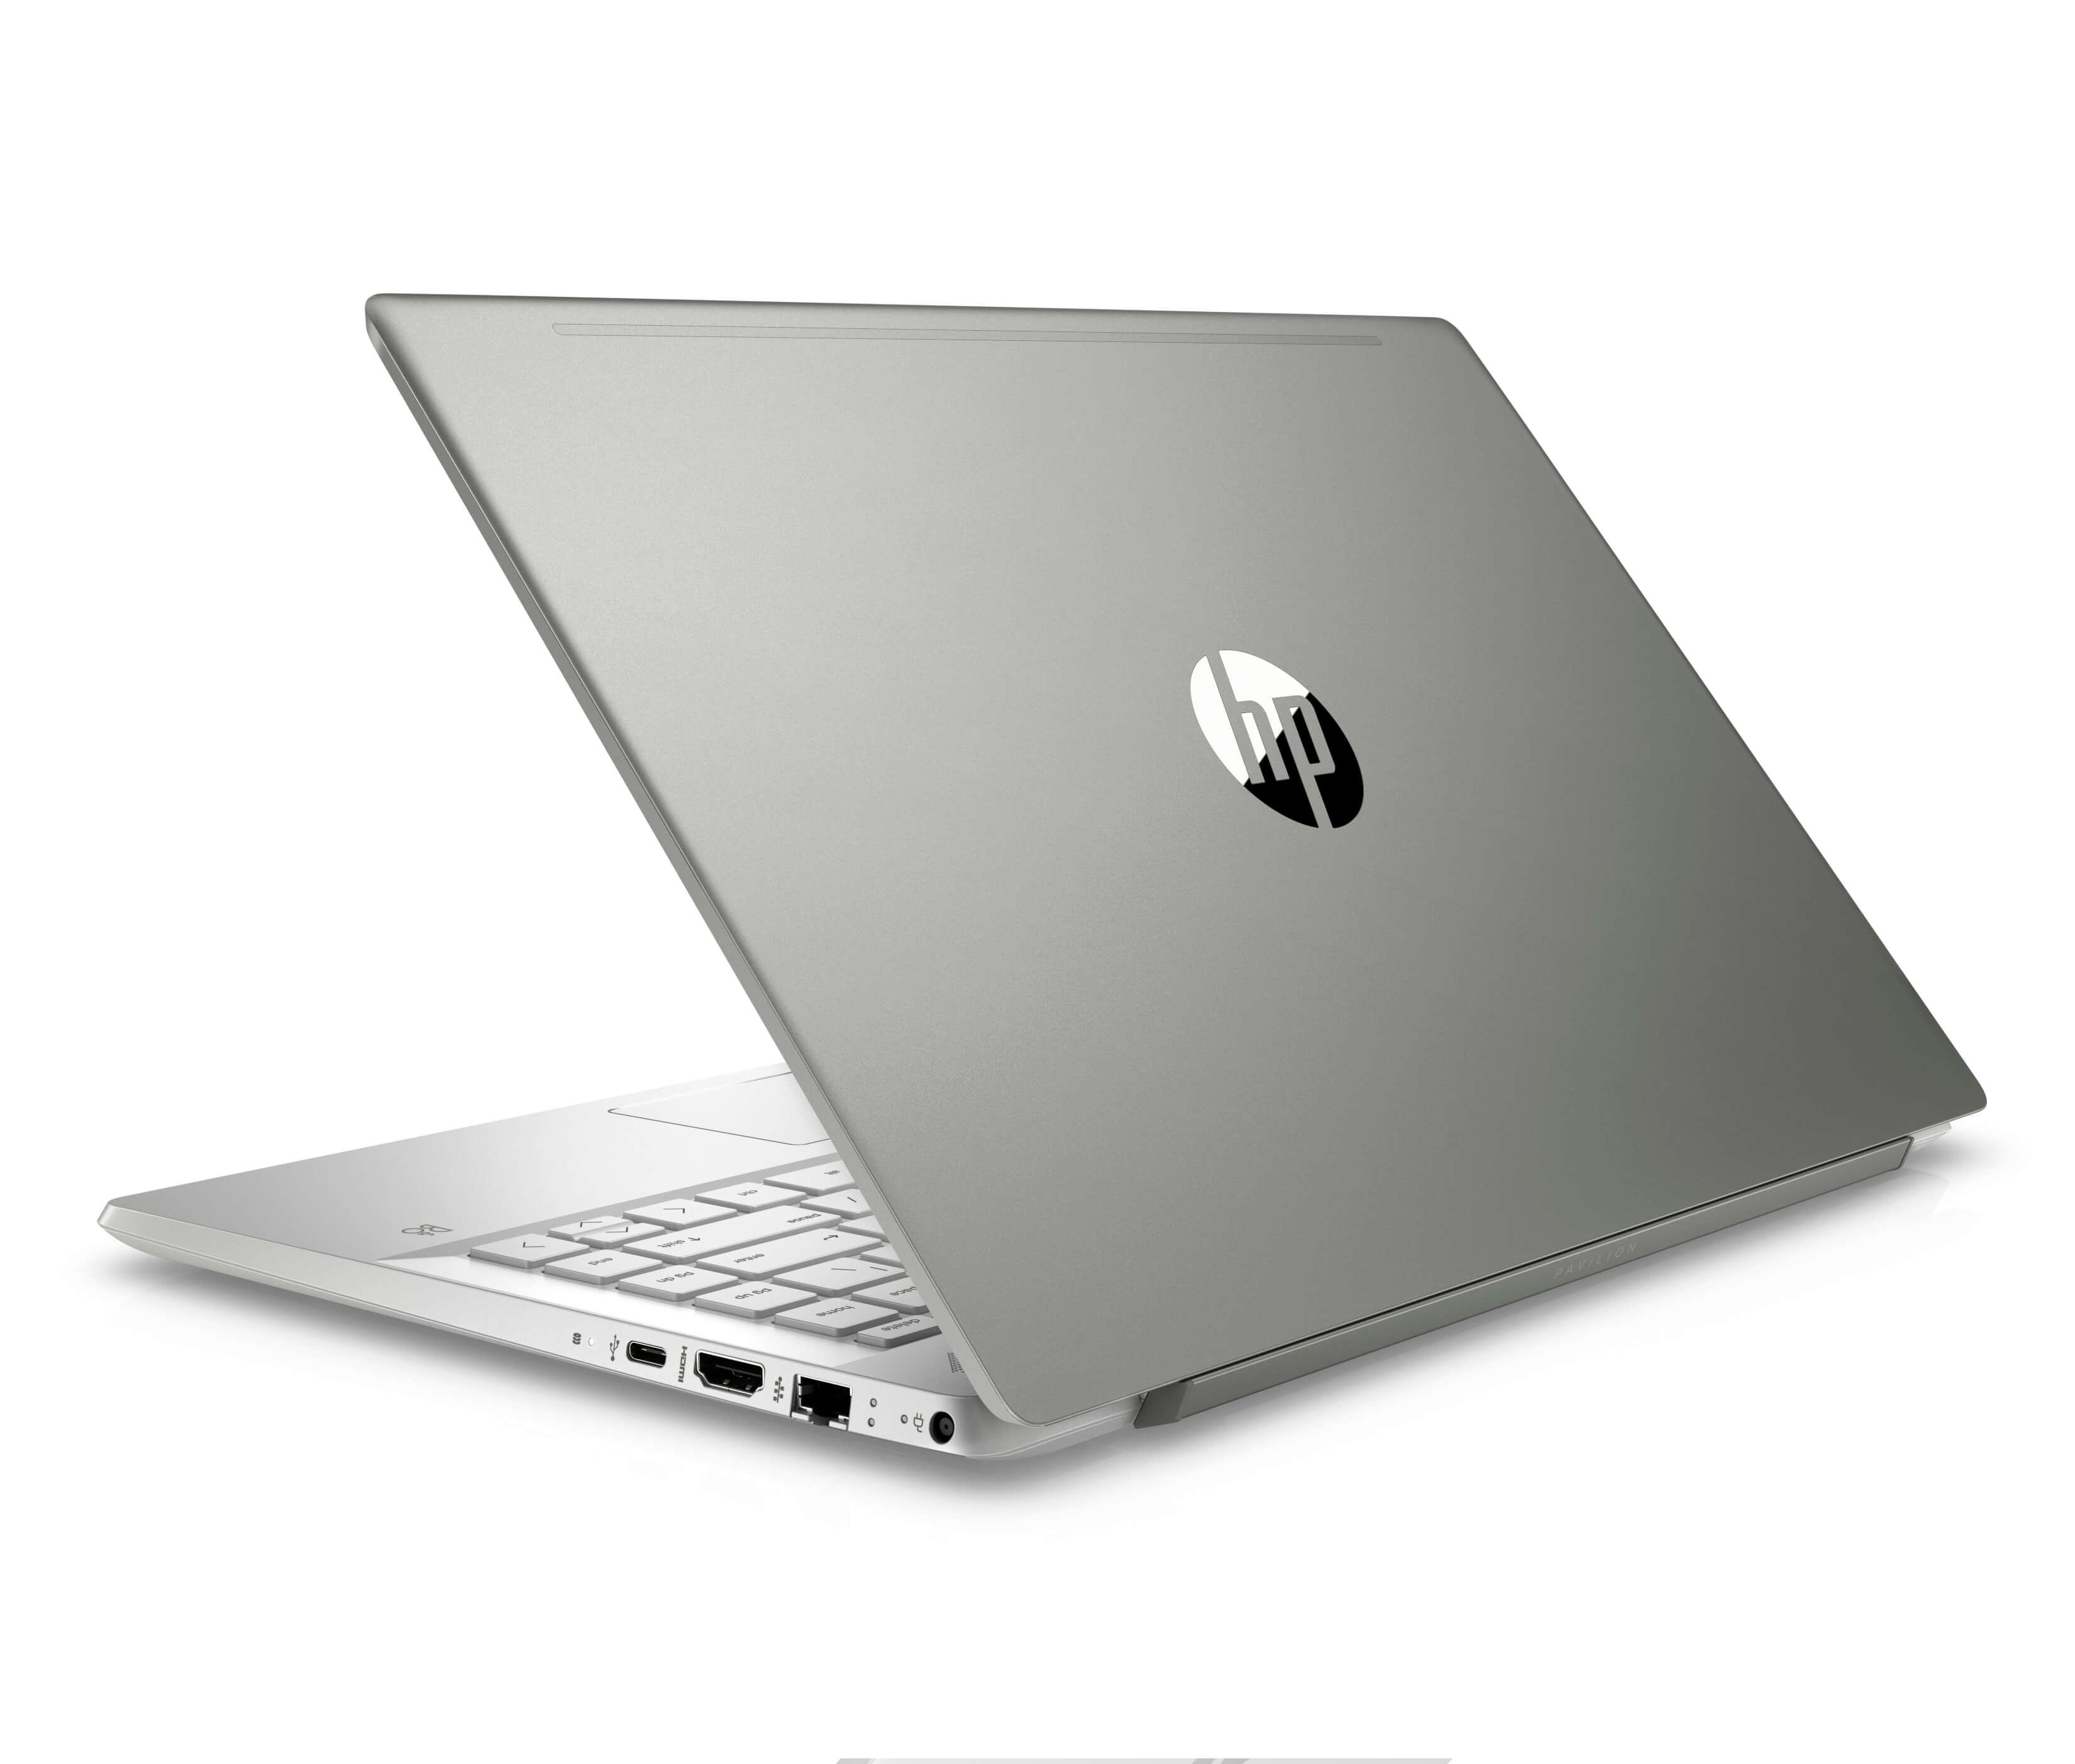 Laptop battery tester online dating